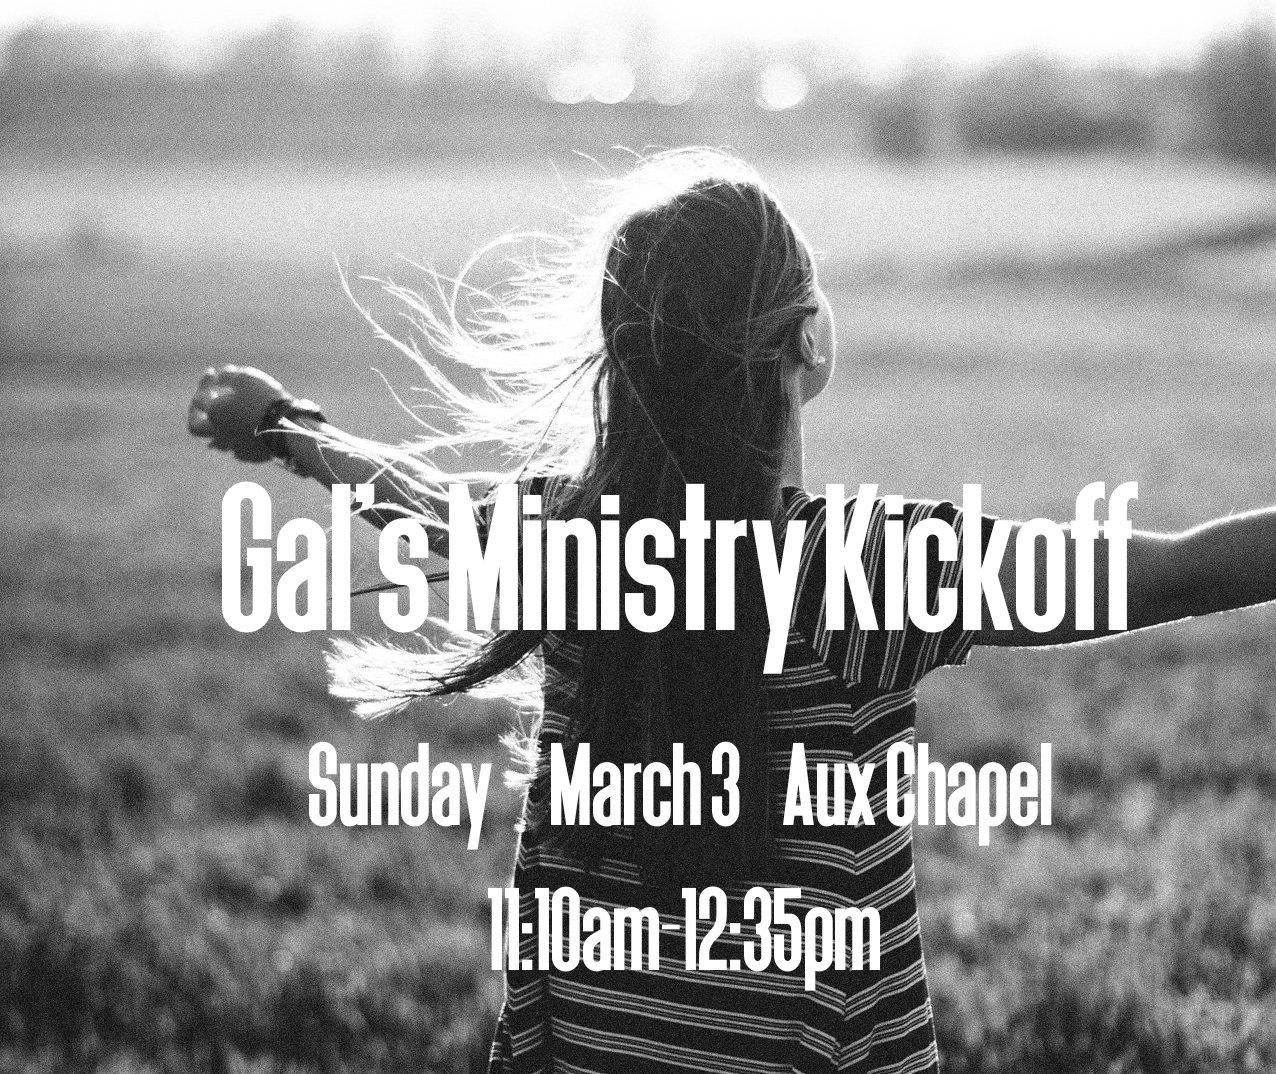 Gal's Ministry Kickoff.jpg